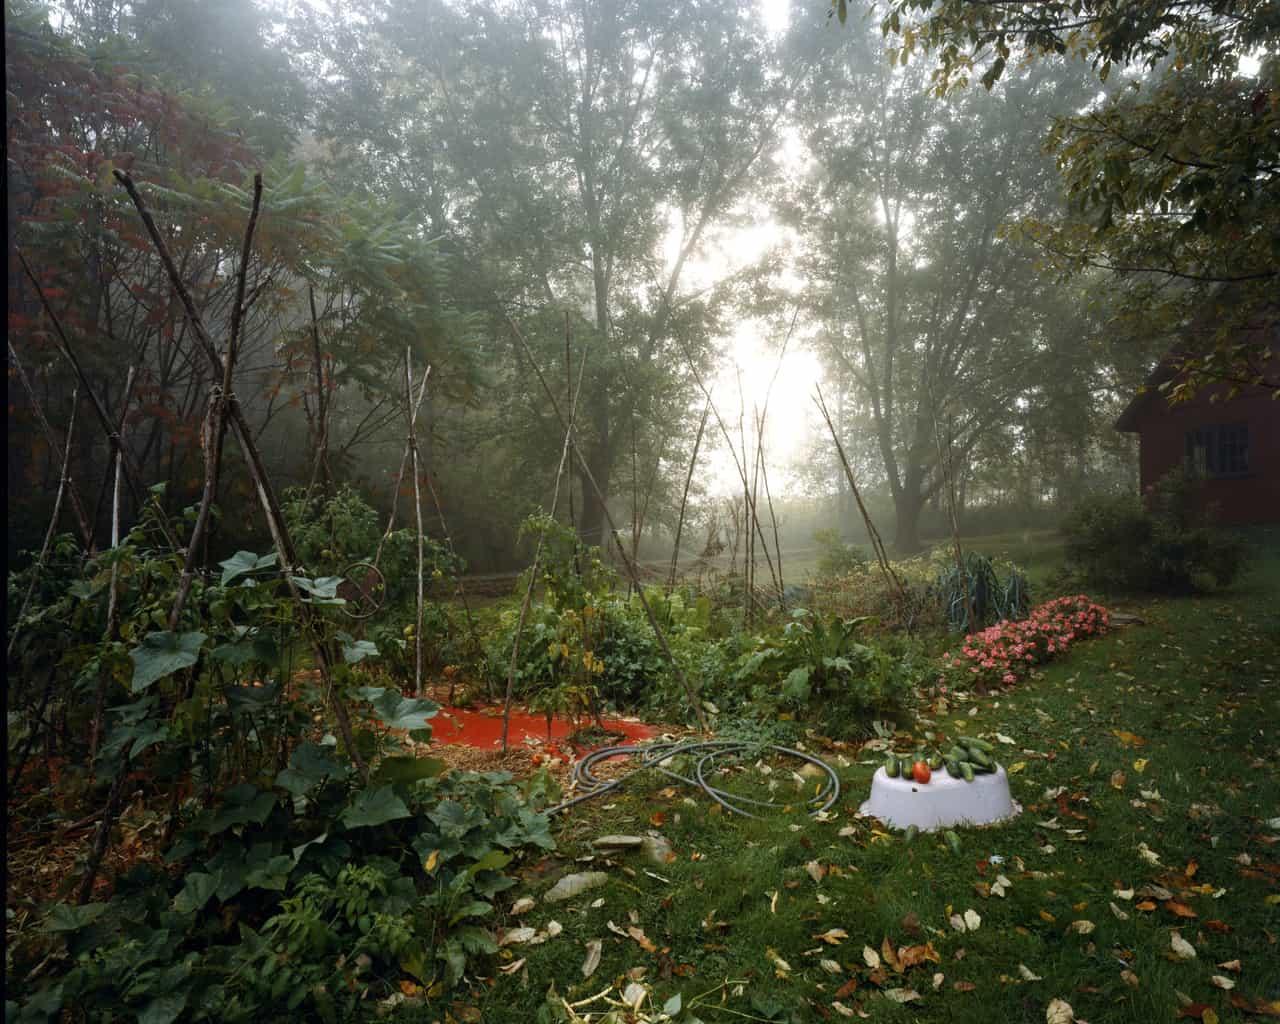 Fall Garden, Lyme, NH, 2005